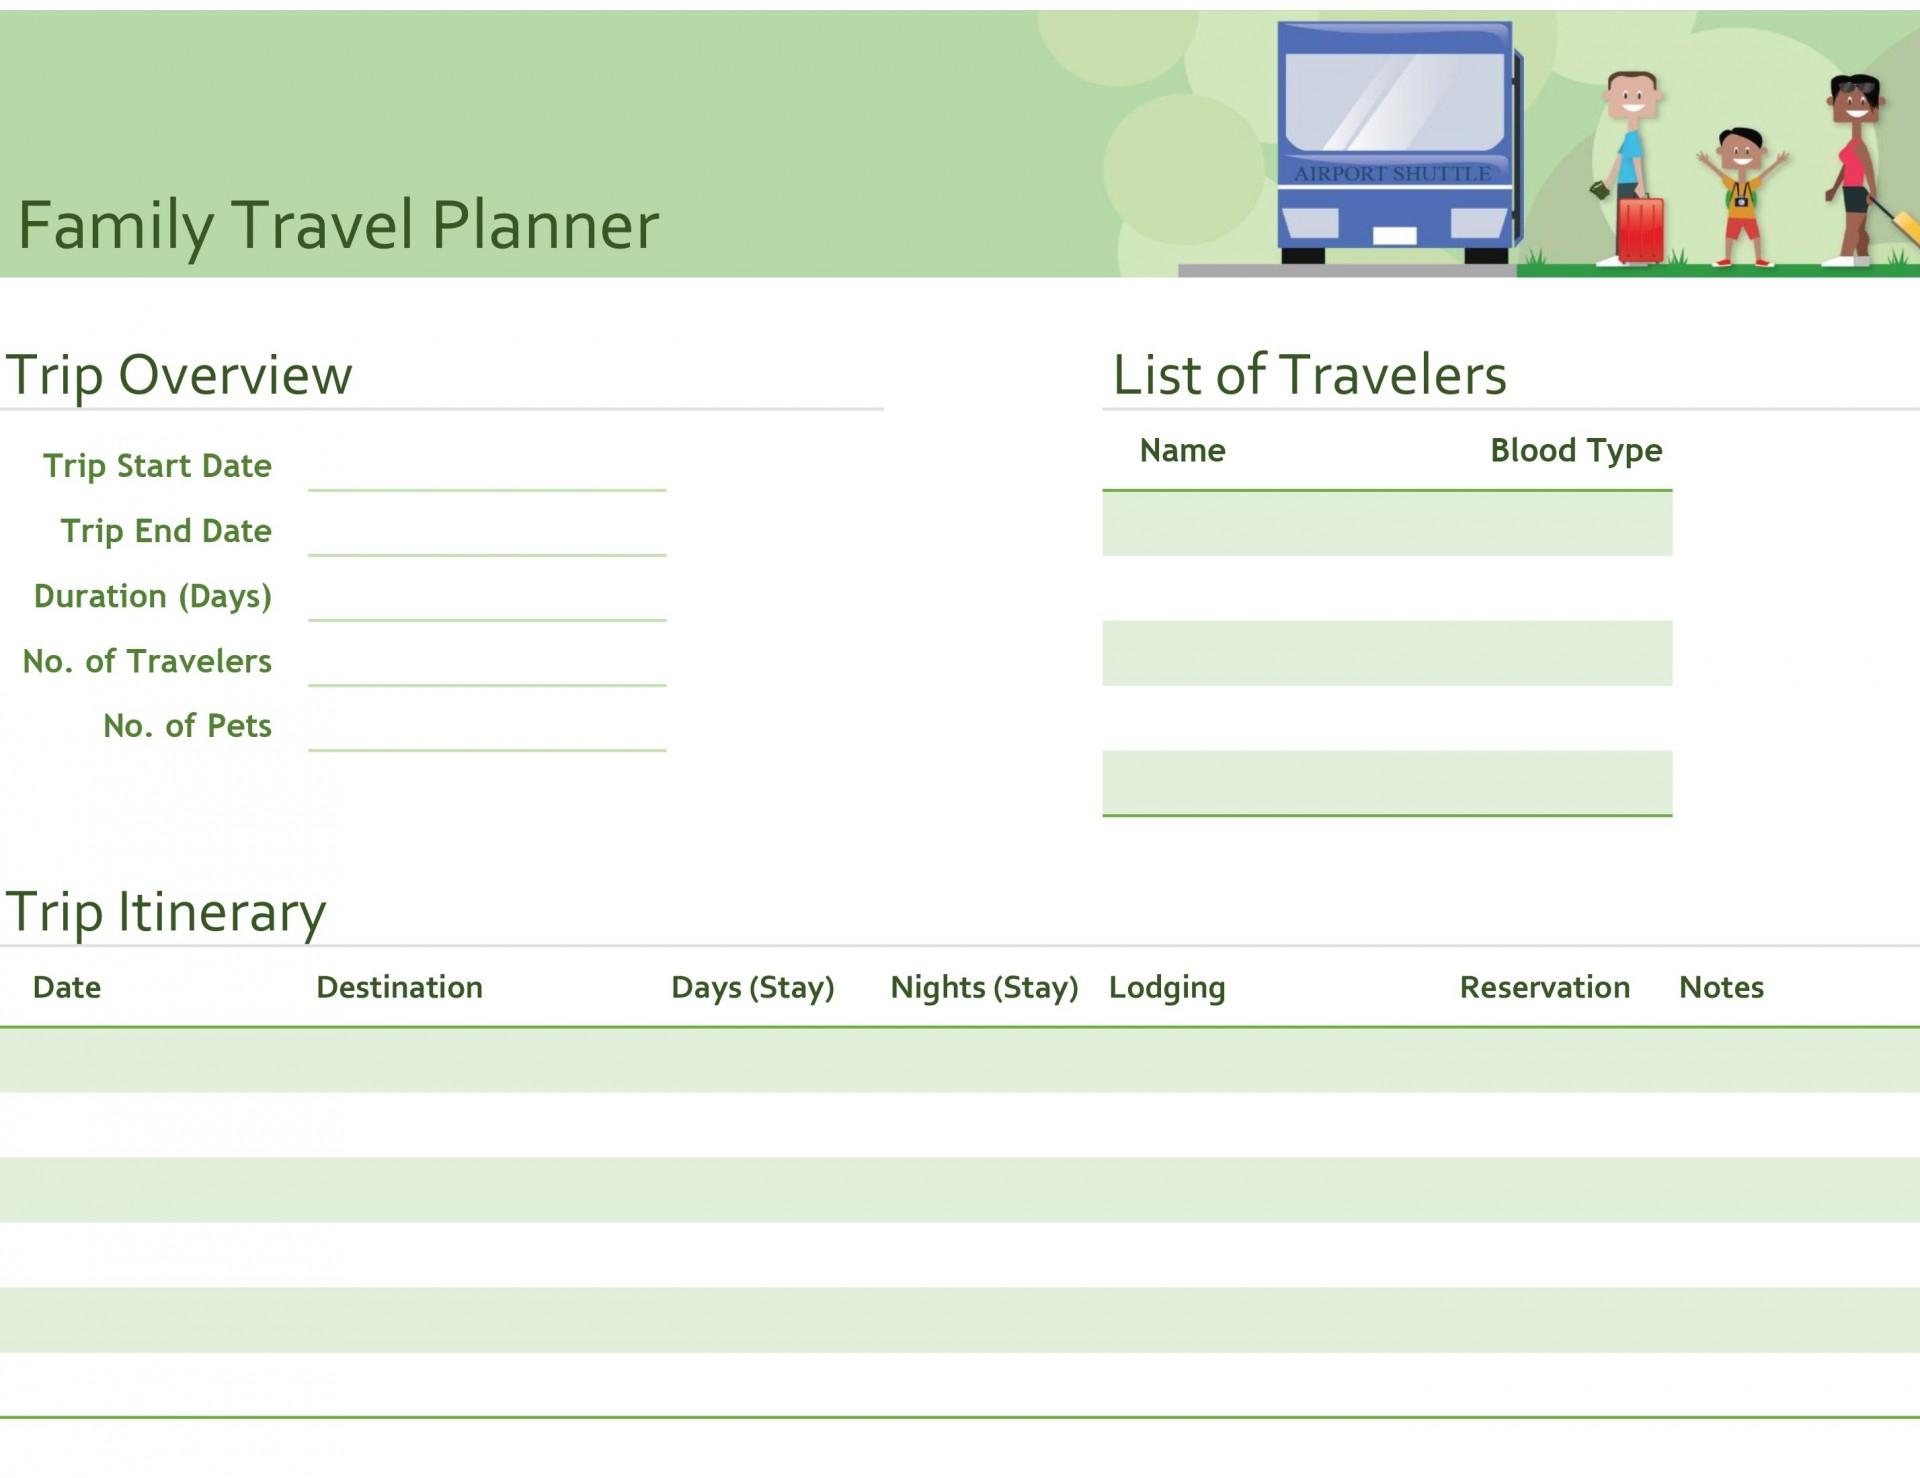 011 Holiday Planning Calendar Template Plan Templates Imposing pertaining to Calendar Templates In Office 365